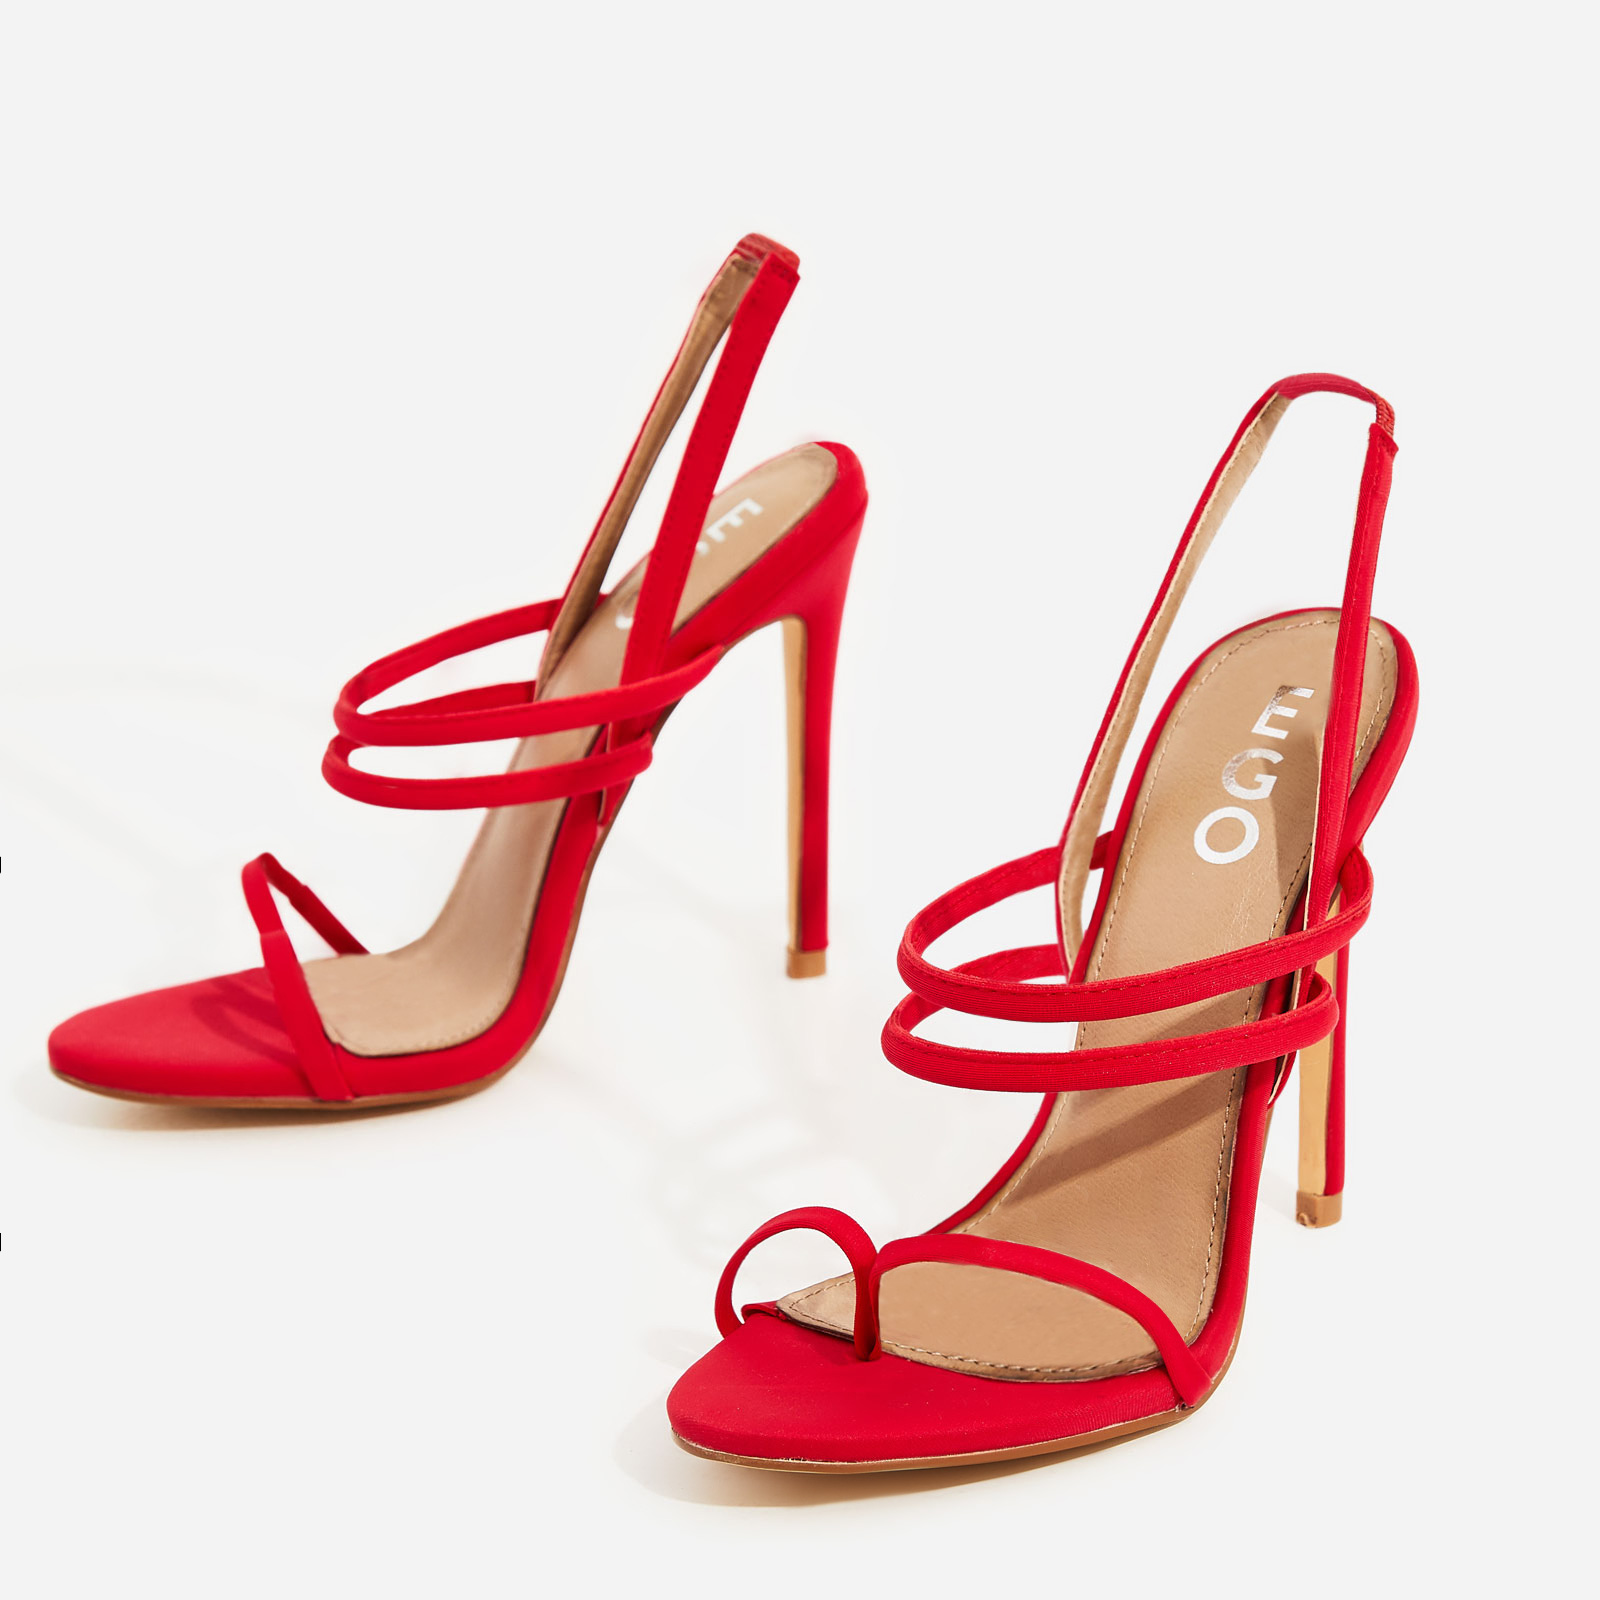 Rhia Strappy Toe Post Heel In Red Lycra